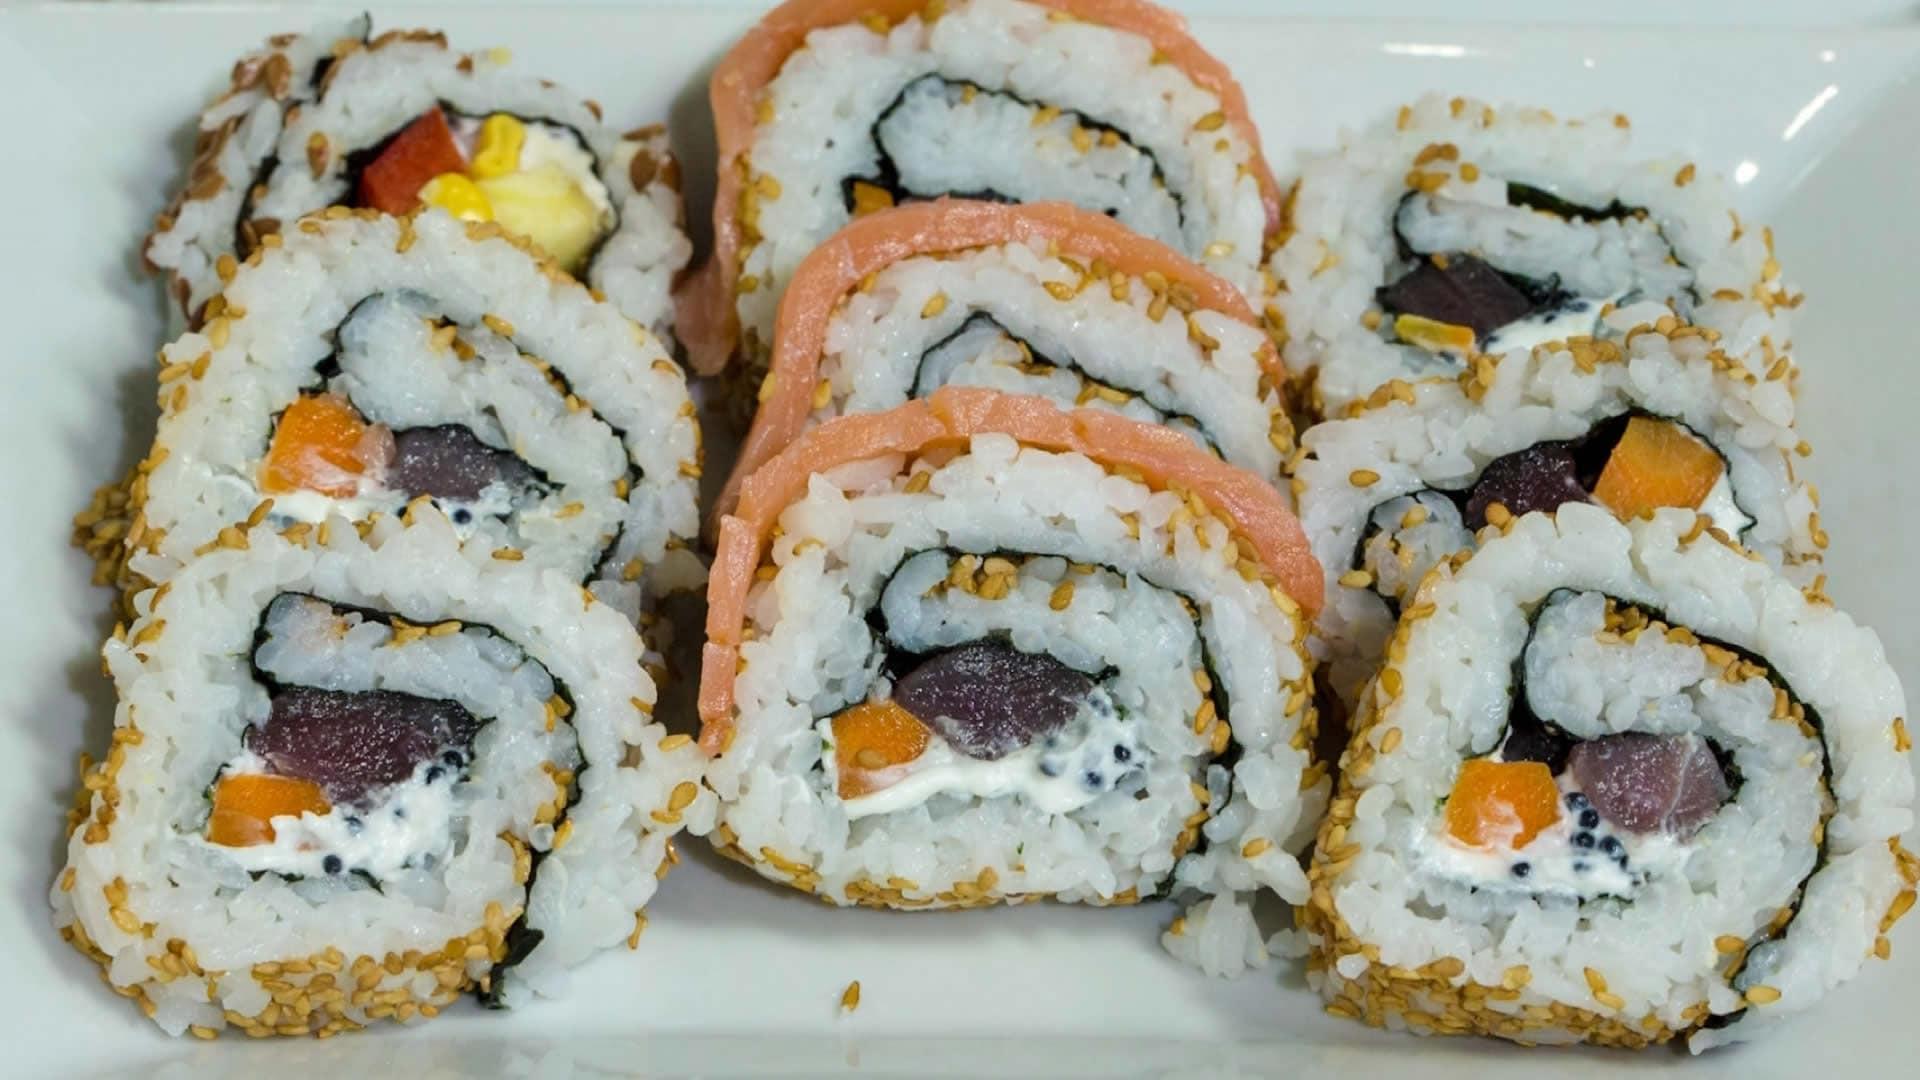 Foto Uramaki Sushi o California Roll